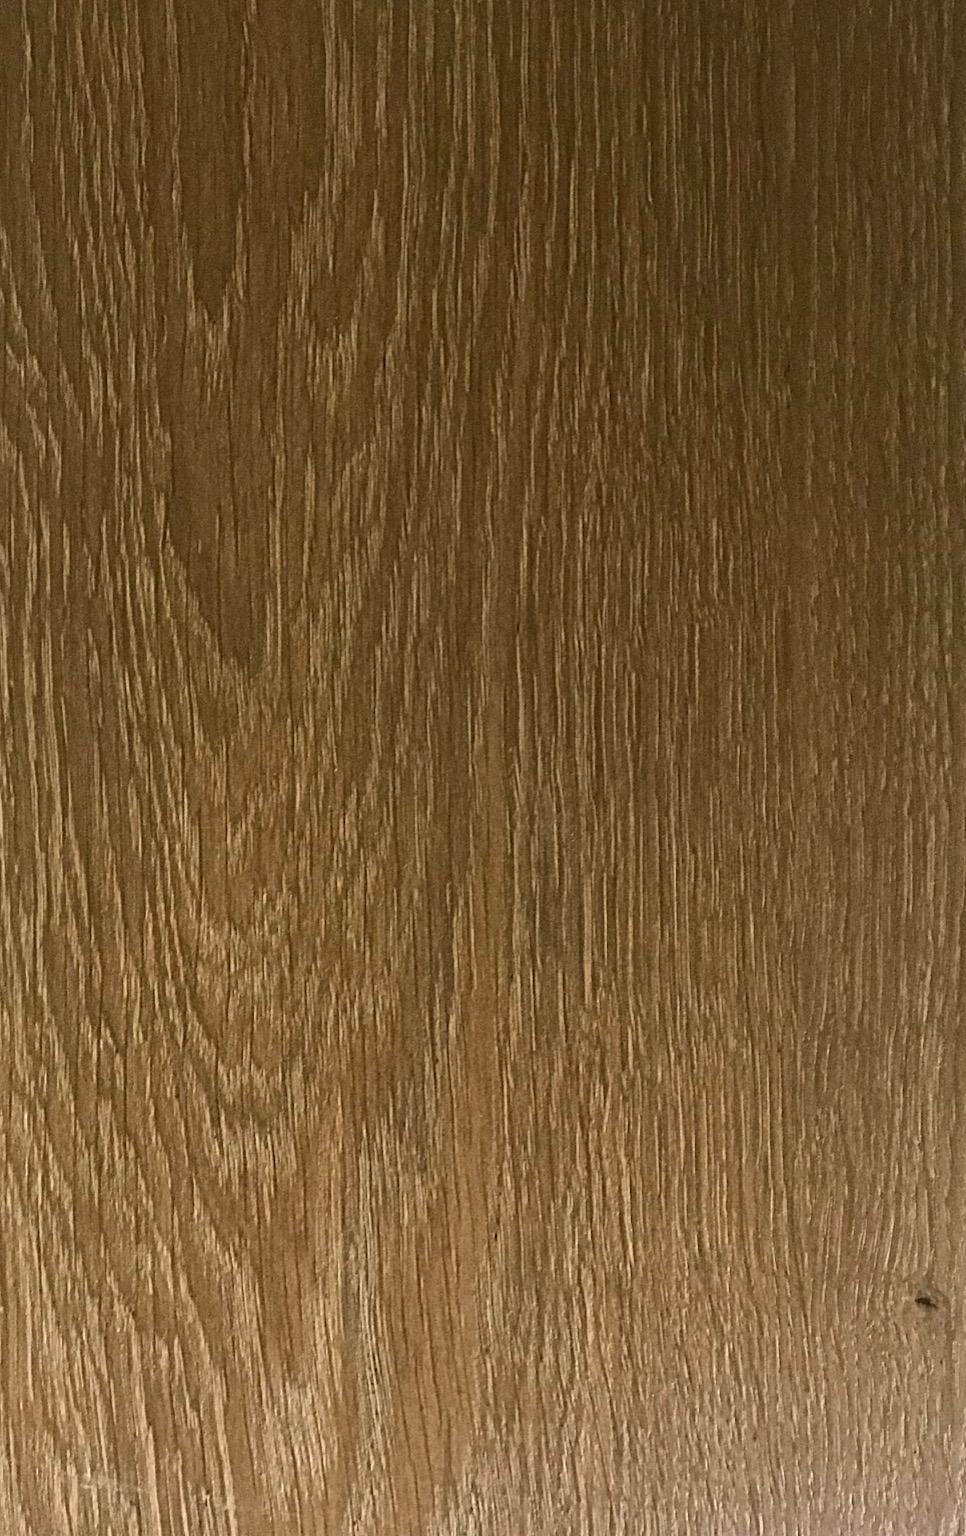 Brushed Brown Oak 2602